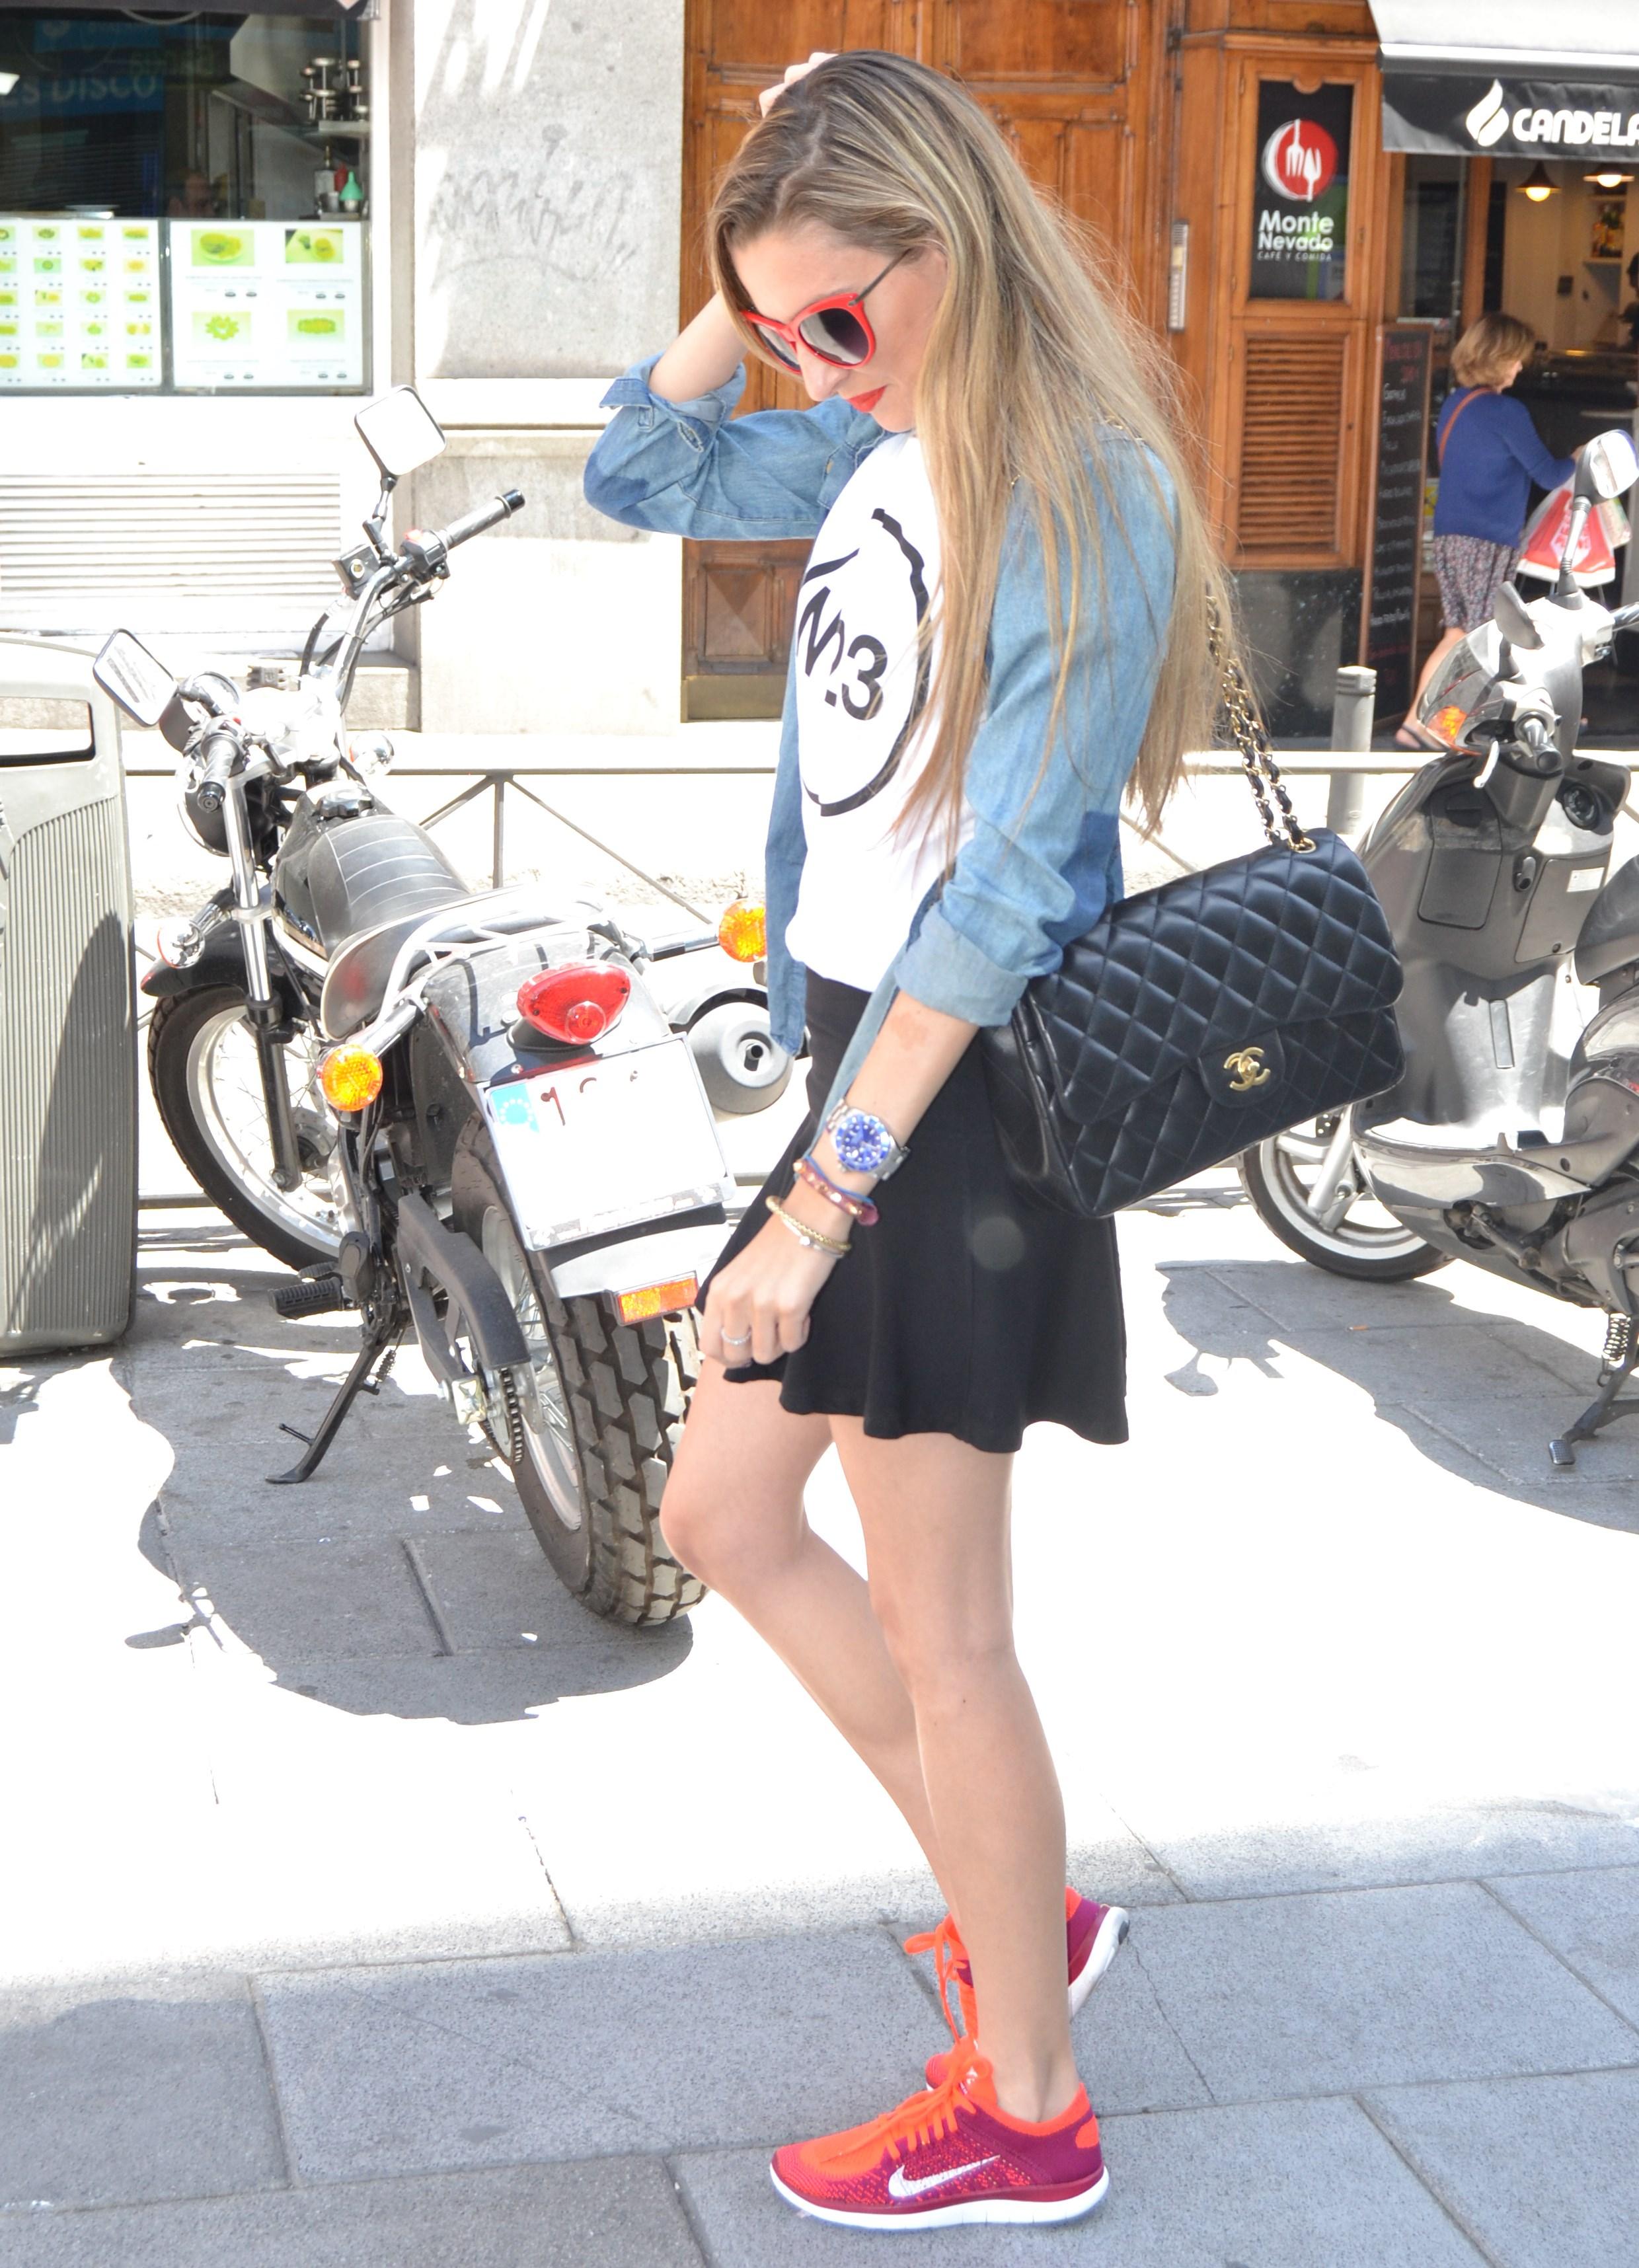 Nike_Free_FlyKnight_Sneakers_Chanel_255_Chanel_Bag_Guess_Sunglasses_Denim_Shirt_Lara_Martin_Gilarranz_Bymyheels (1)